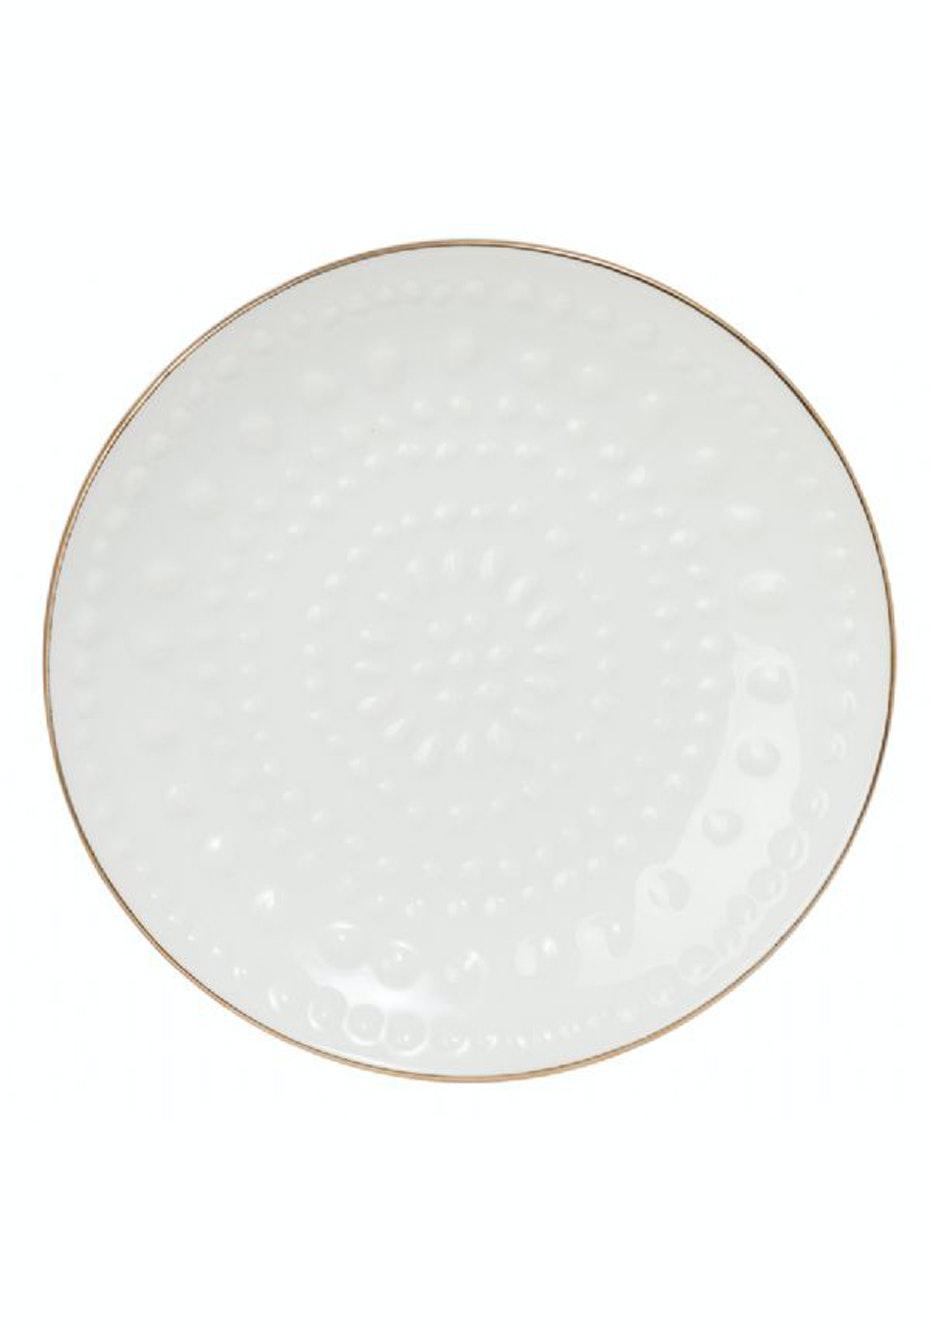 General Eclectic - Trinket Dish Gold Rim